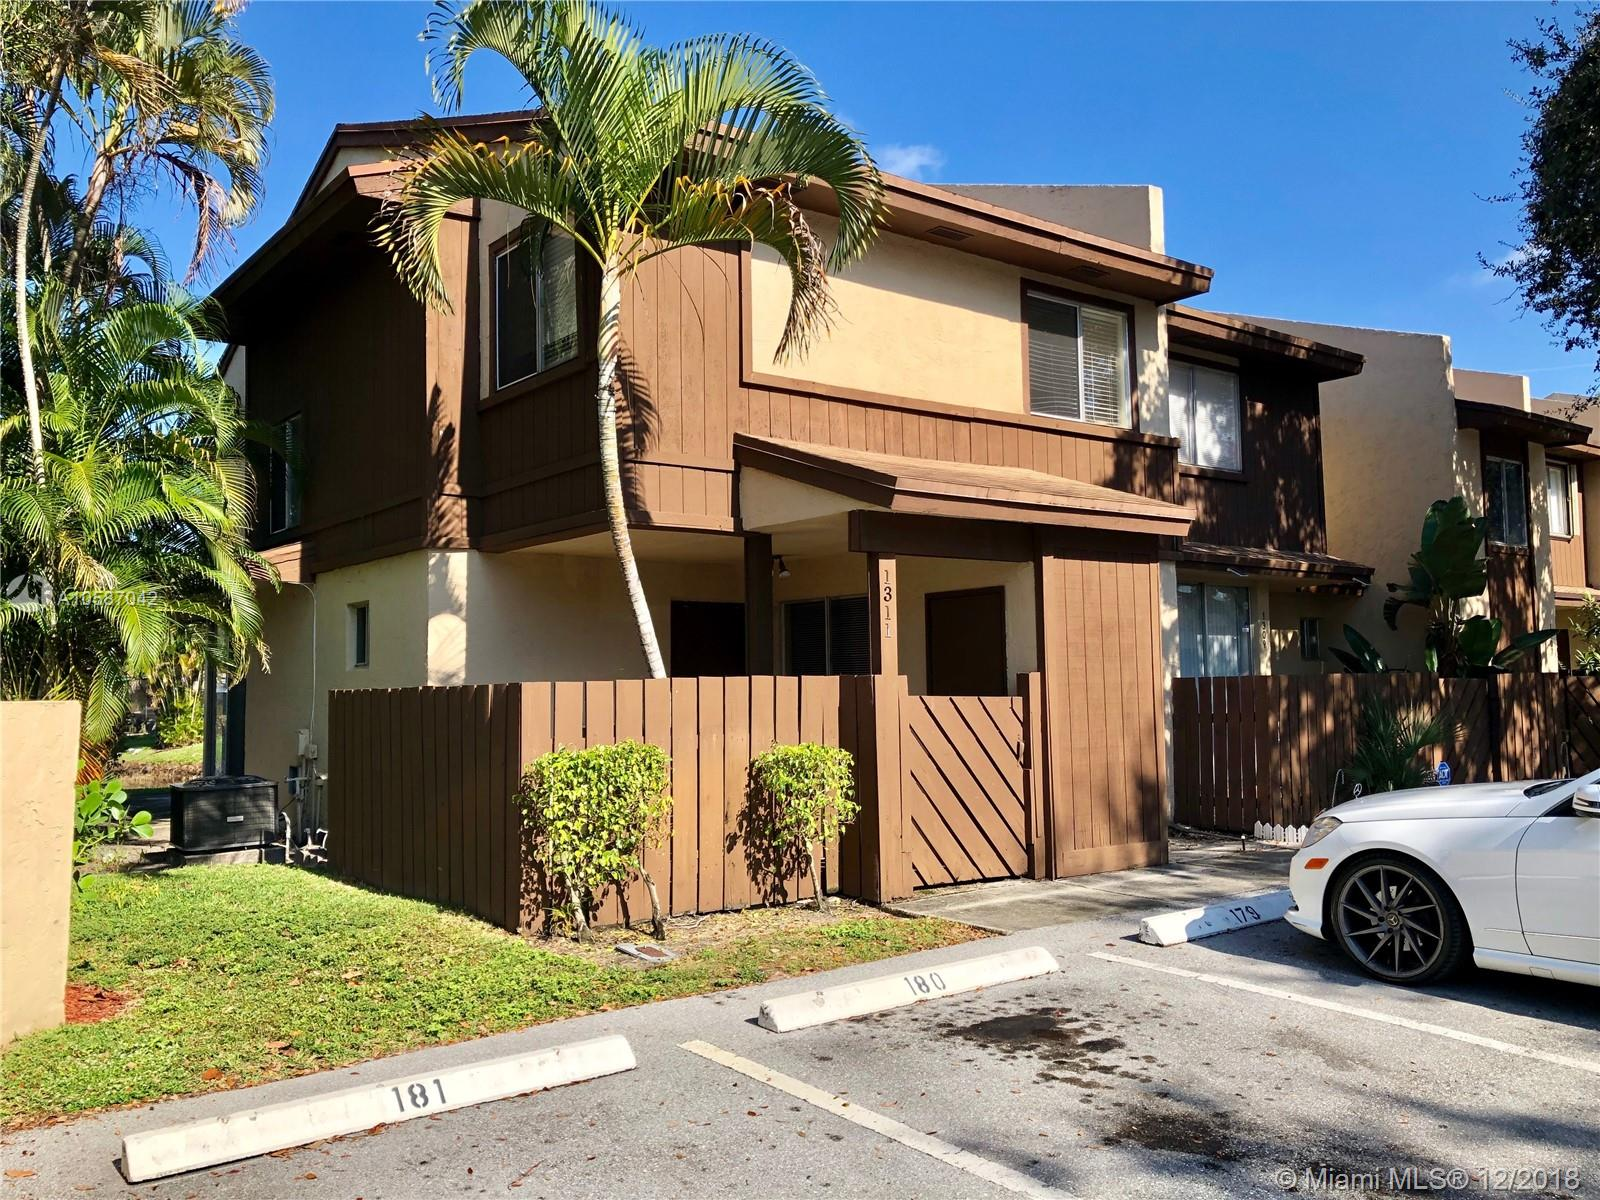 1311 Hampton Blvd, North Lauderdale, FL 33068